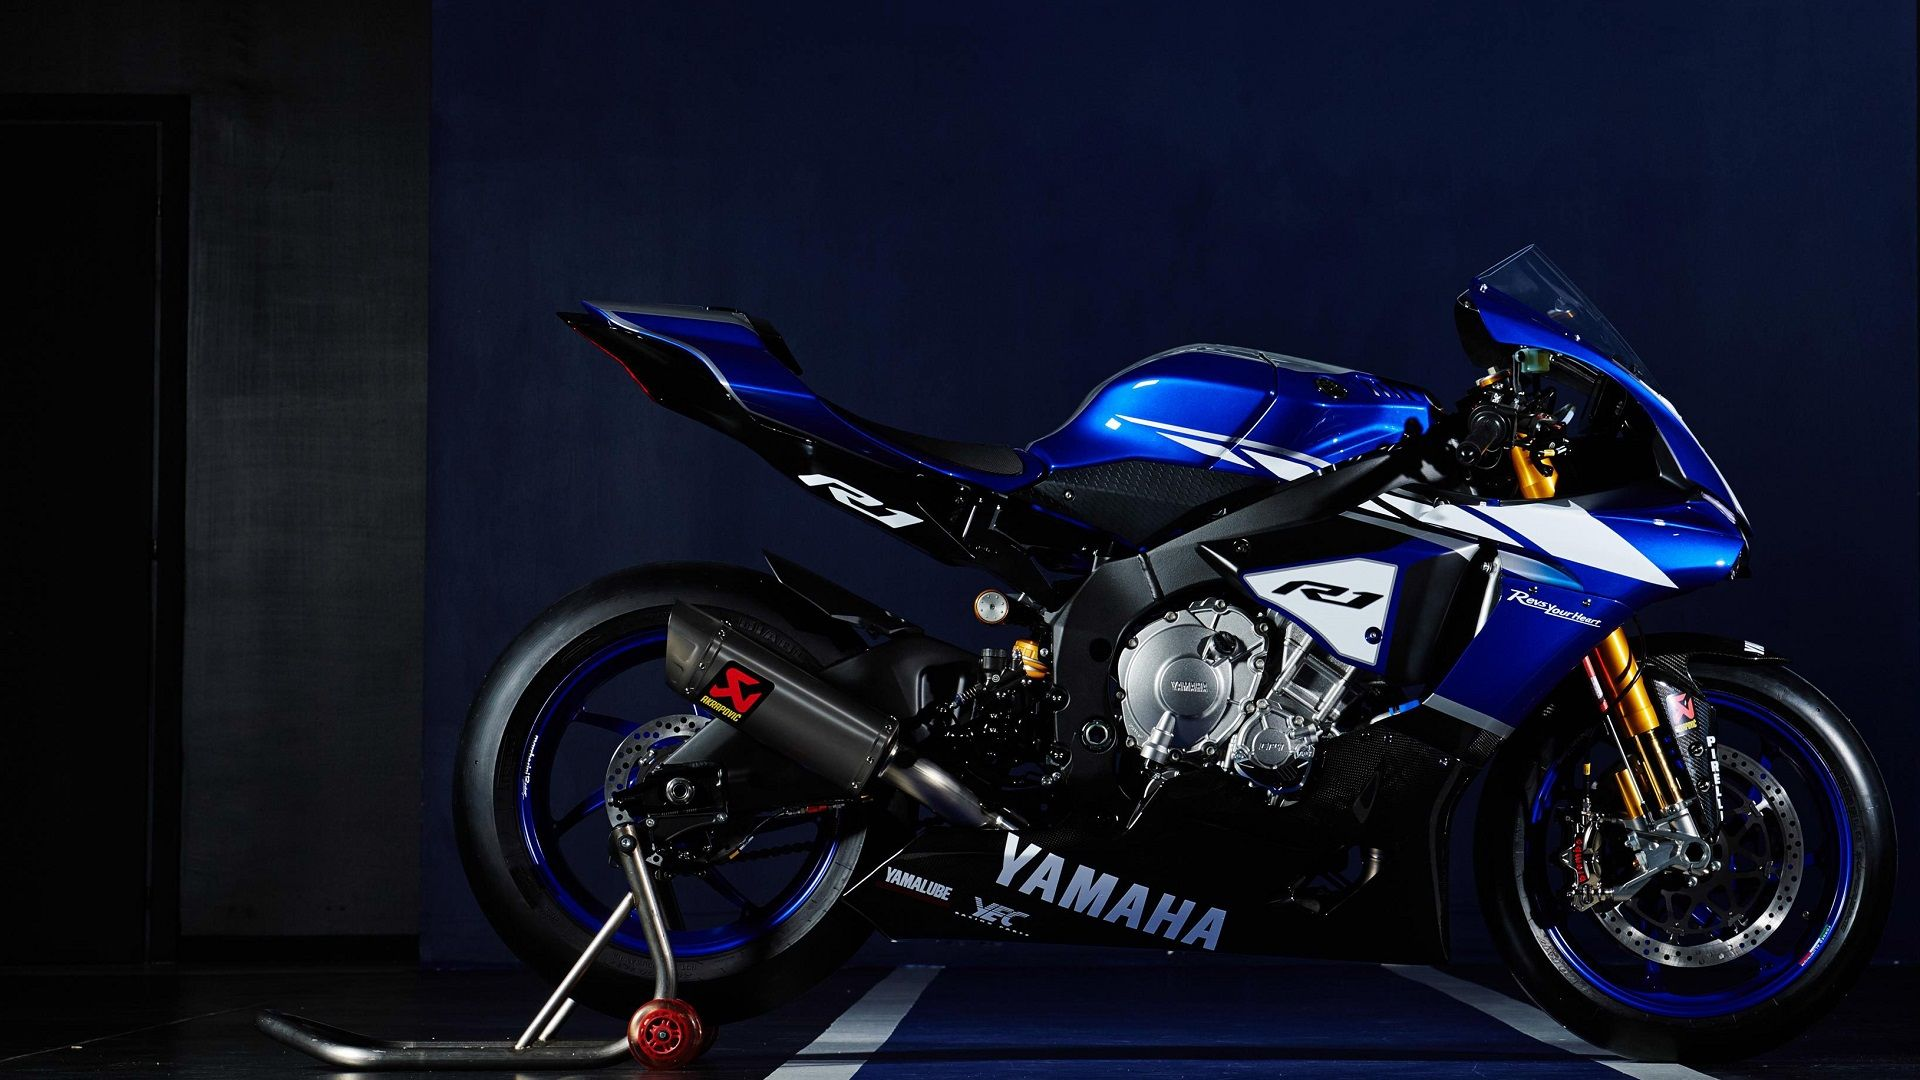 Yamaha hd picture